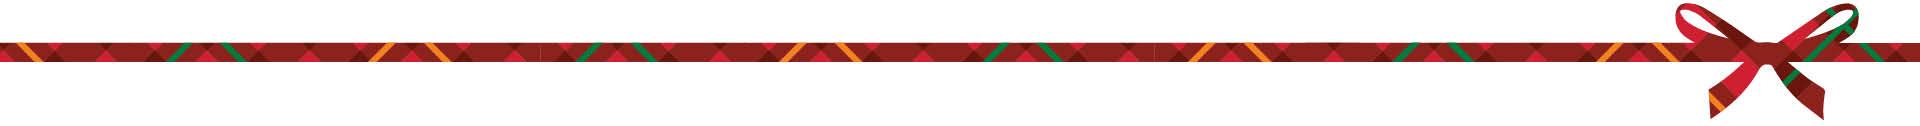 Holiday Ribbon Décor, top